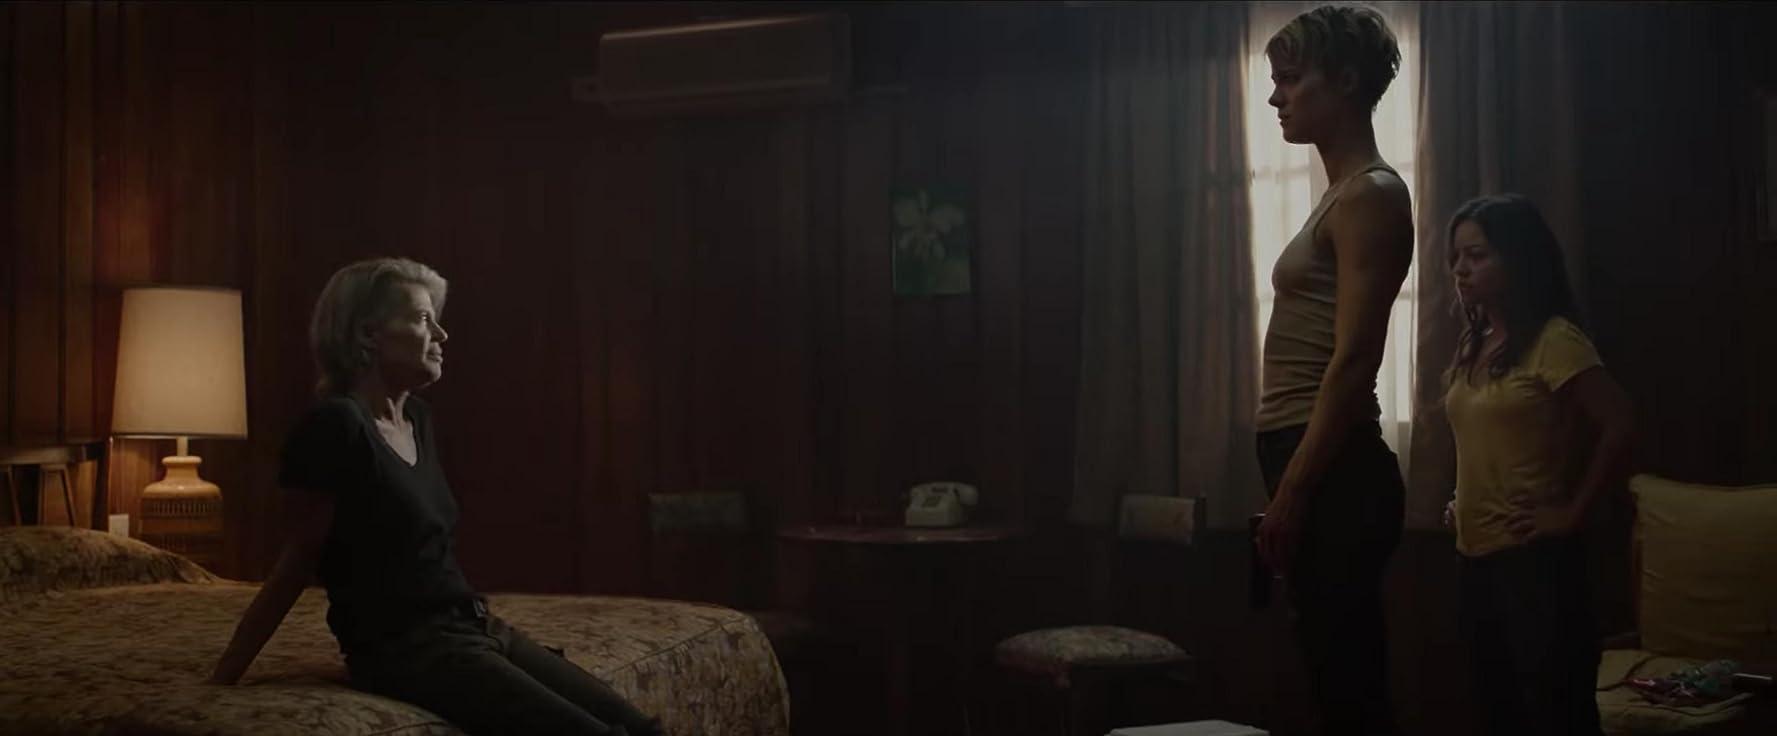 Linda Hamilton, Natalia Reyes, and Mackenzie Davis in Terminator: Dark Fate (2019)